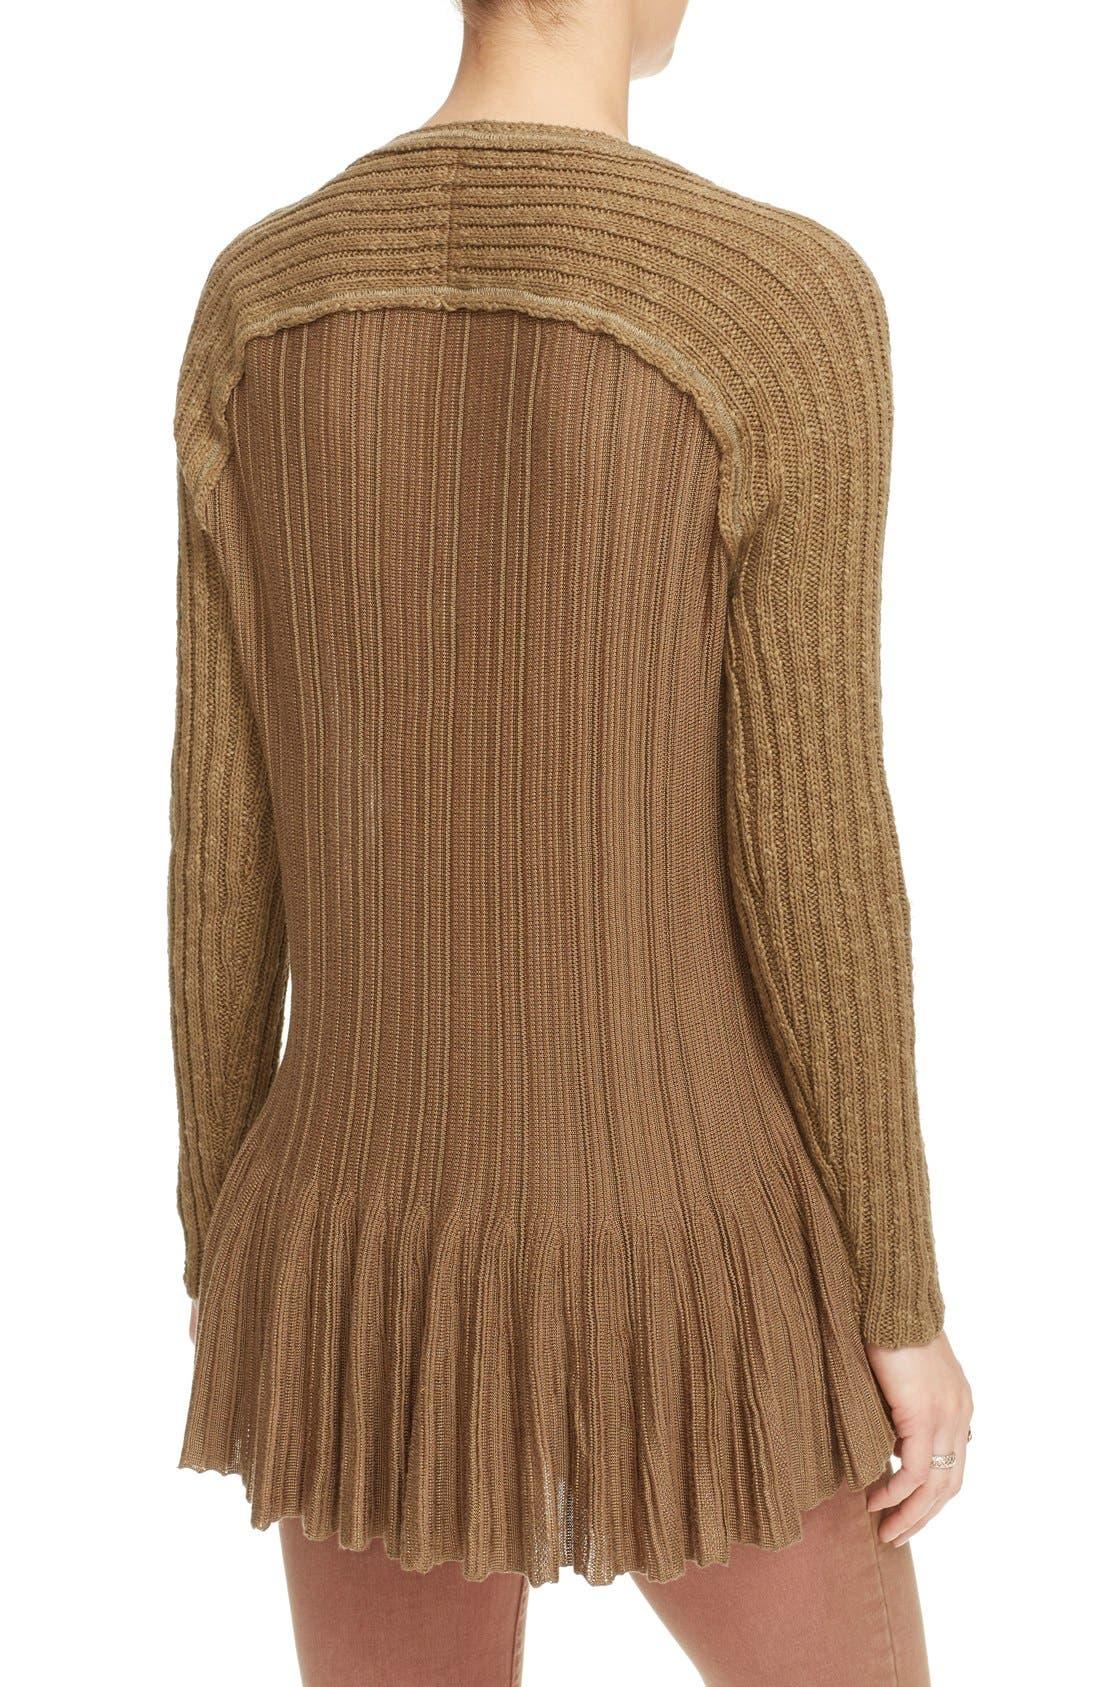 Alternate Image 2  - Free People 'Ribs & Ruffles' Knit Peplum Sweater